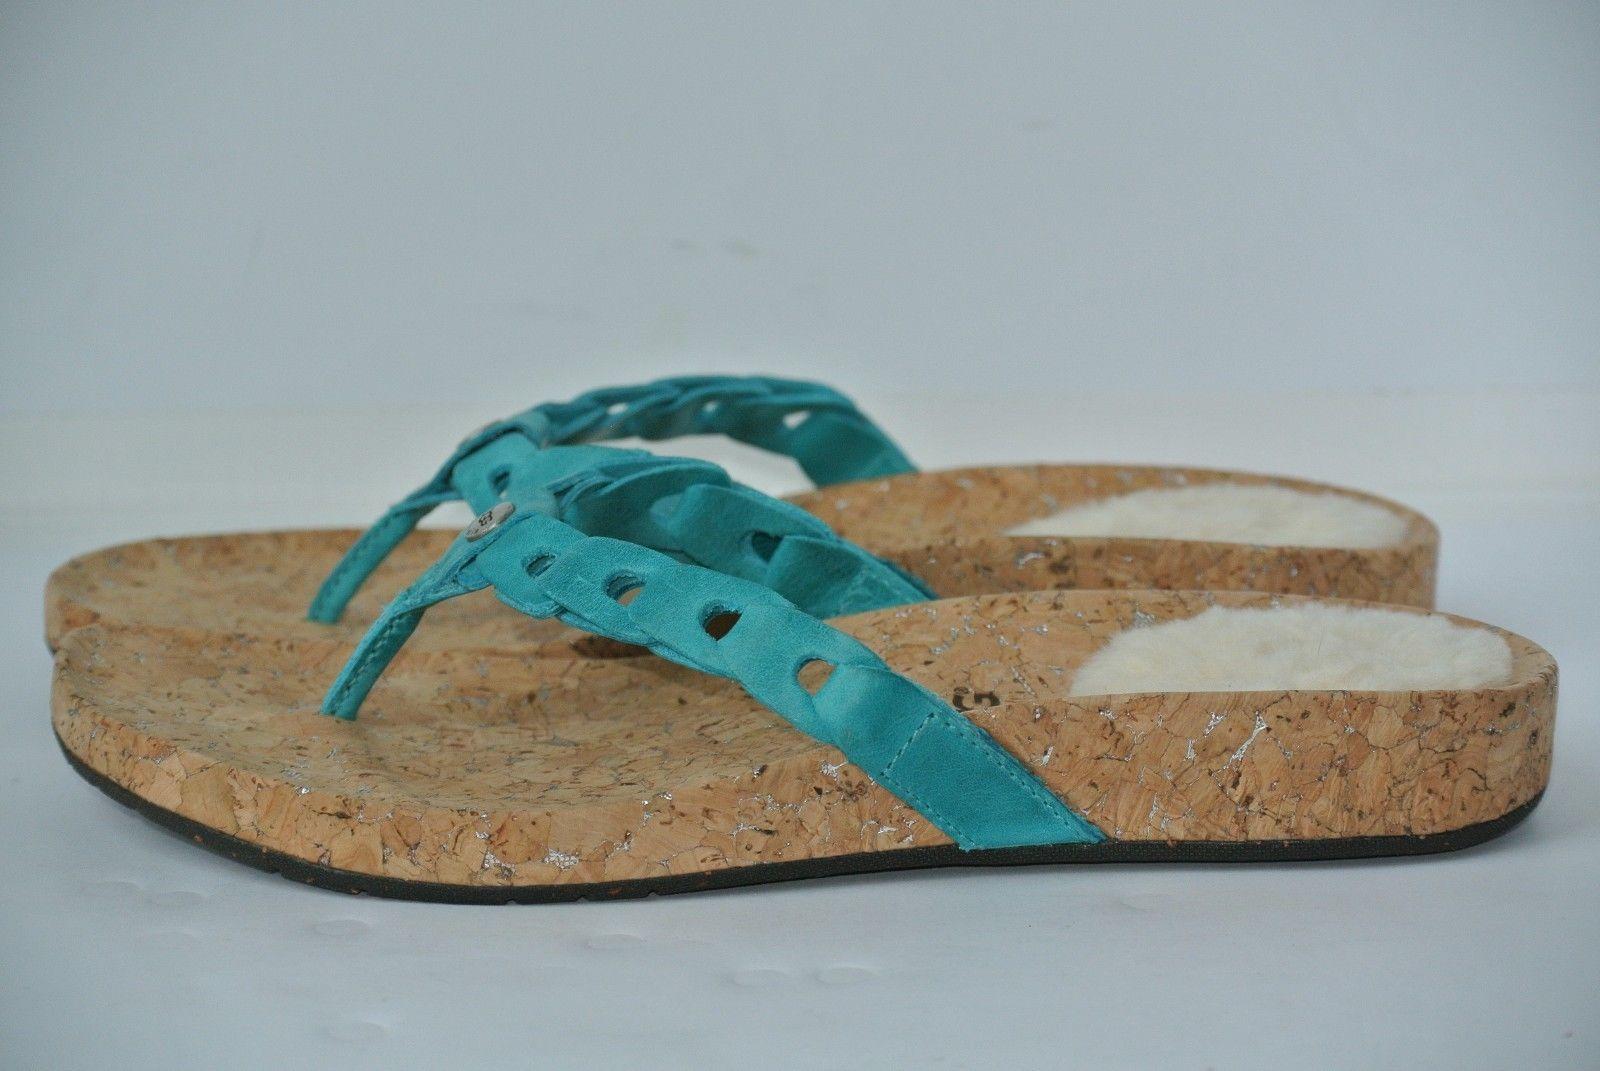 9615cbce2 UGG AUSTRALIA Womens Sz 8 Aqua Blue Leather Flip Flop Sandals 1804 WORN ONCE